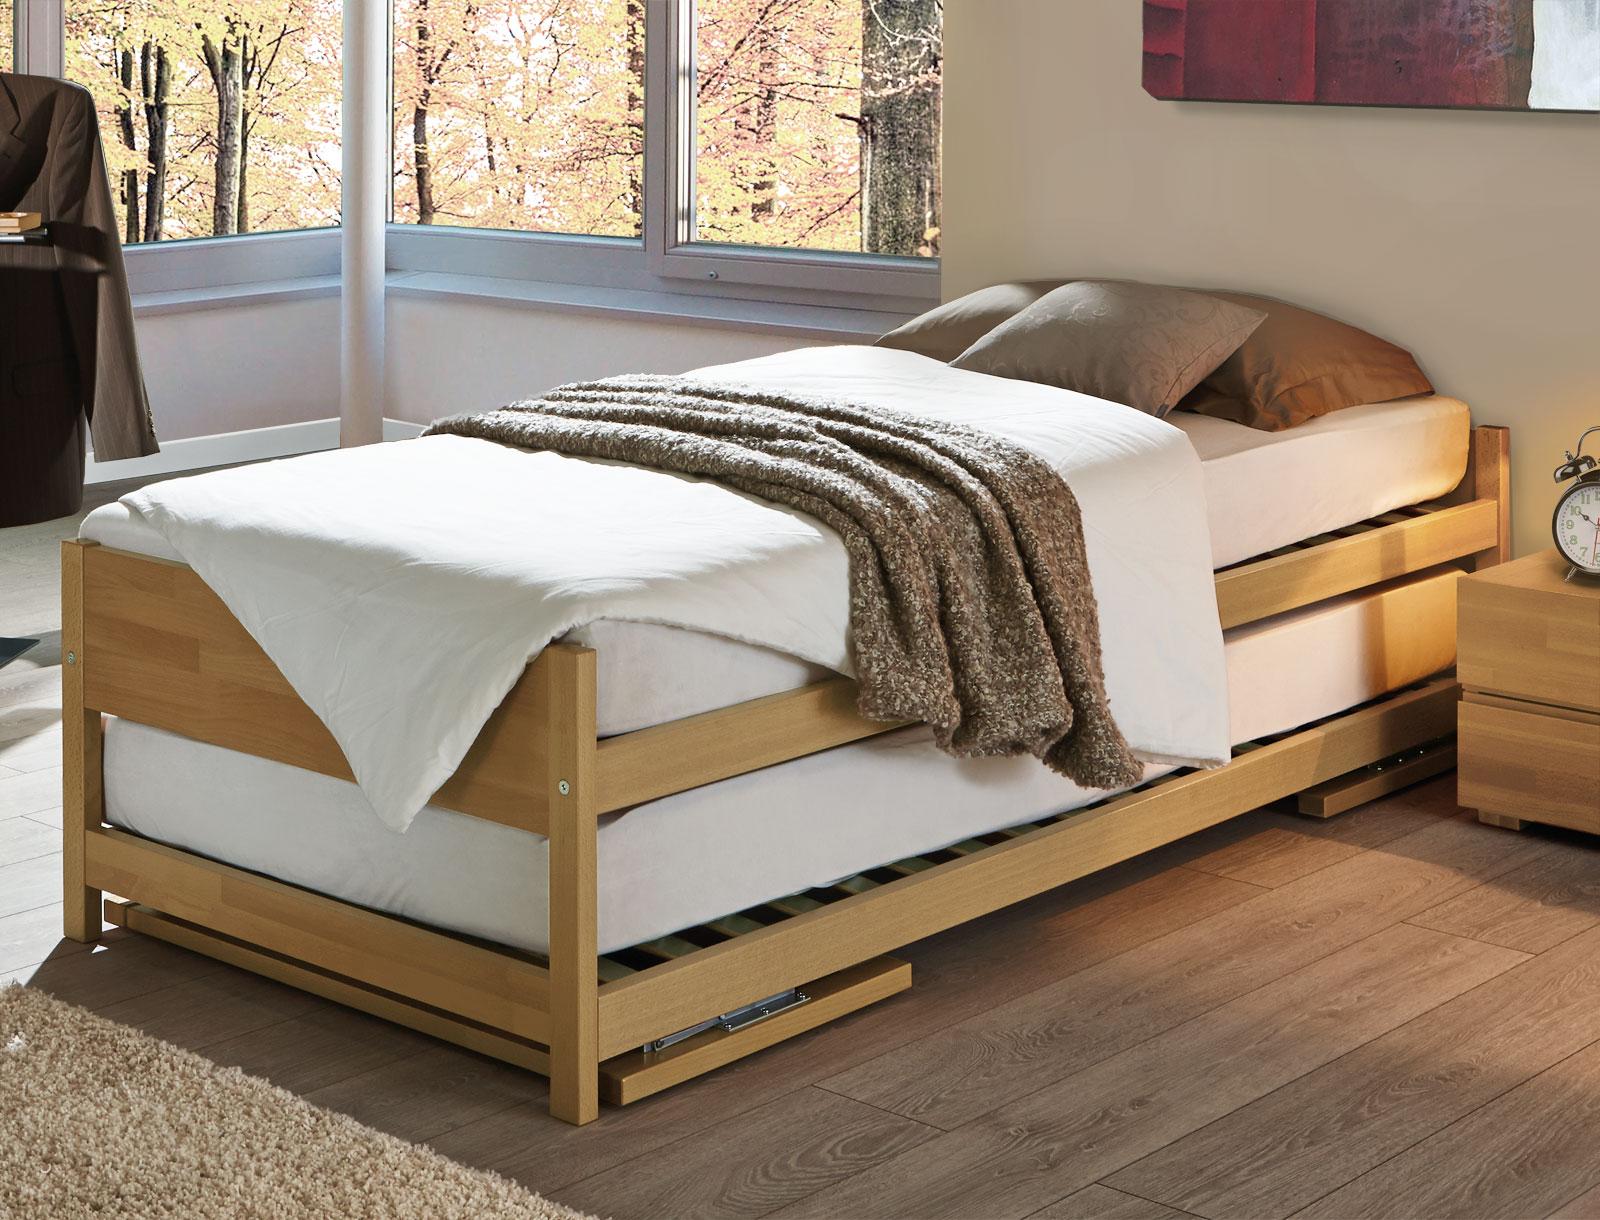 zwei betten gleicher gr e unser ausziehbett on top. Black Bedroom Furniture Sets. Home Design Ideas